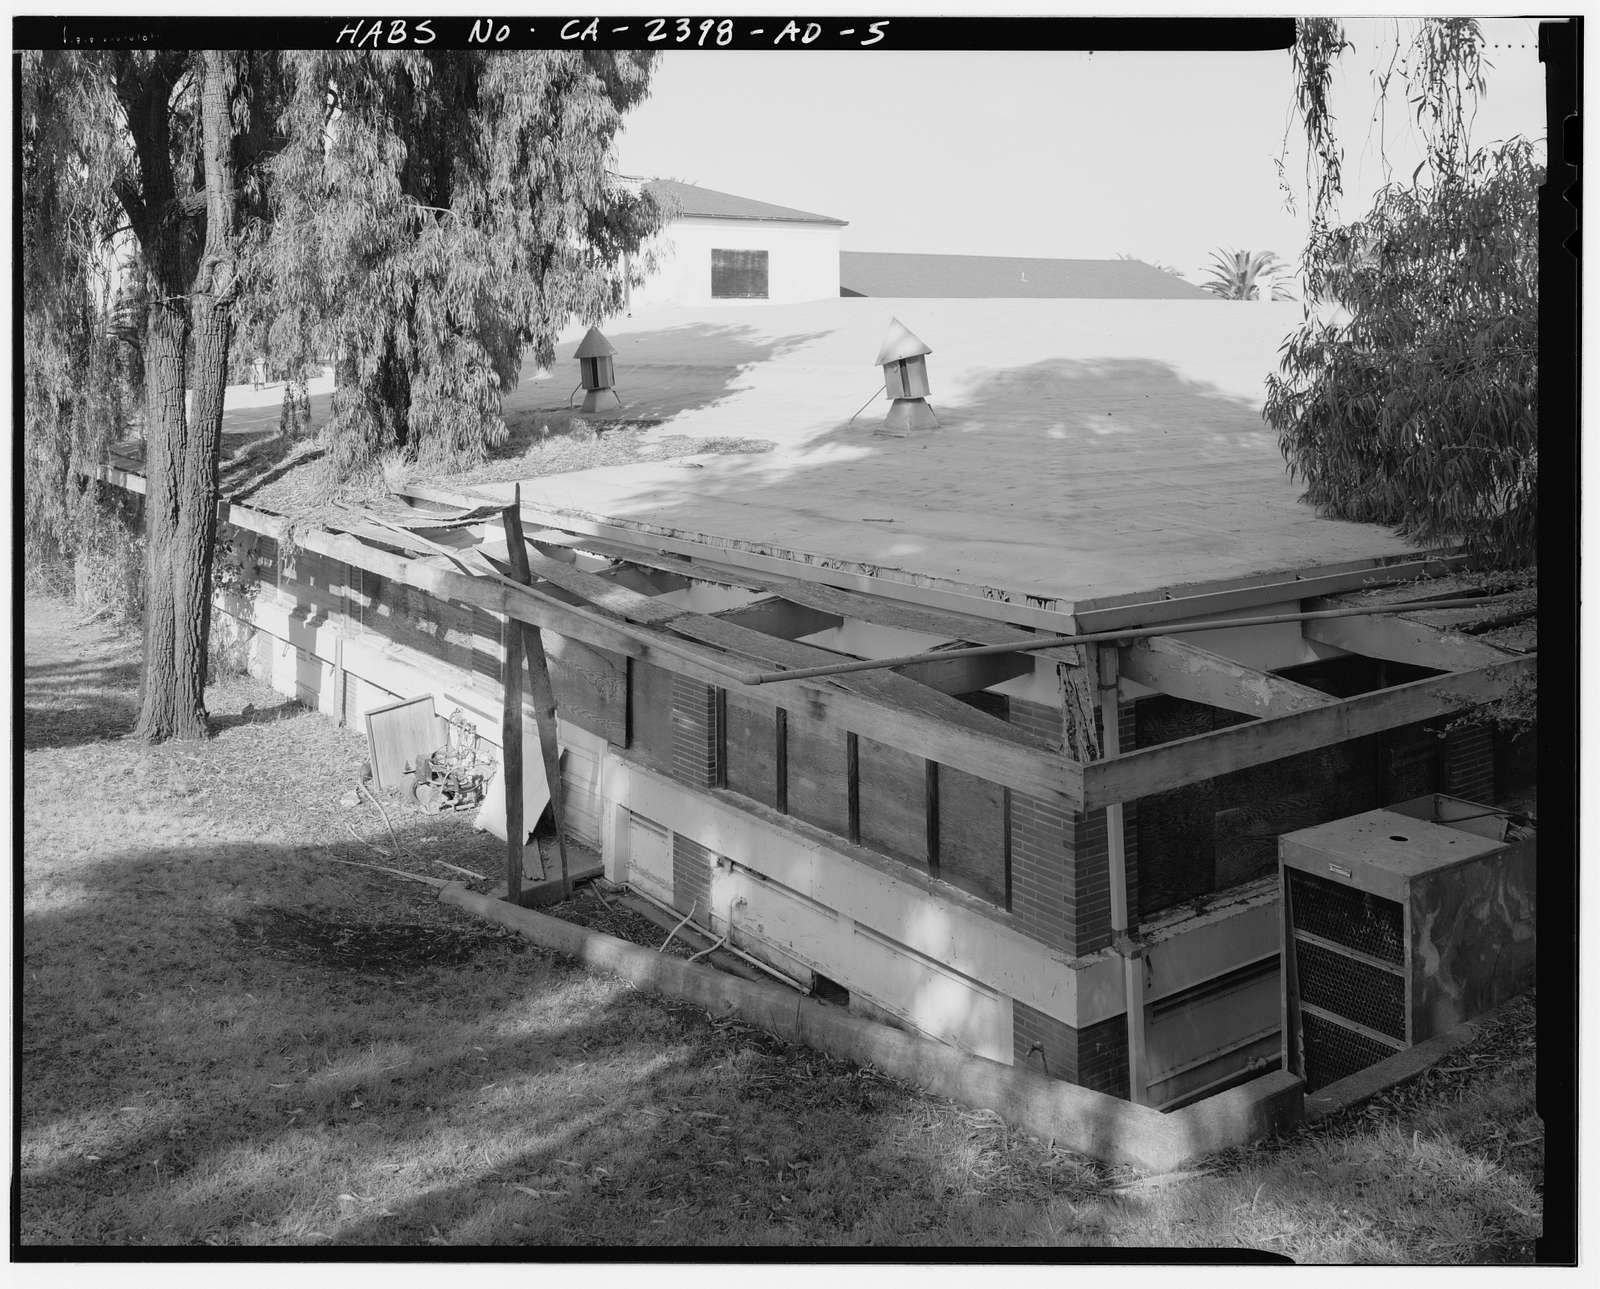 Hamilton Field, Non-Commissioned Officers' Club, Intersection of Palm Avenue & North Oakland Drive, Novato, Marin County, CA